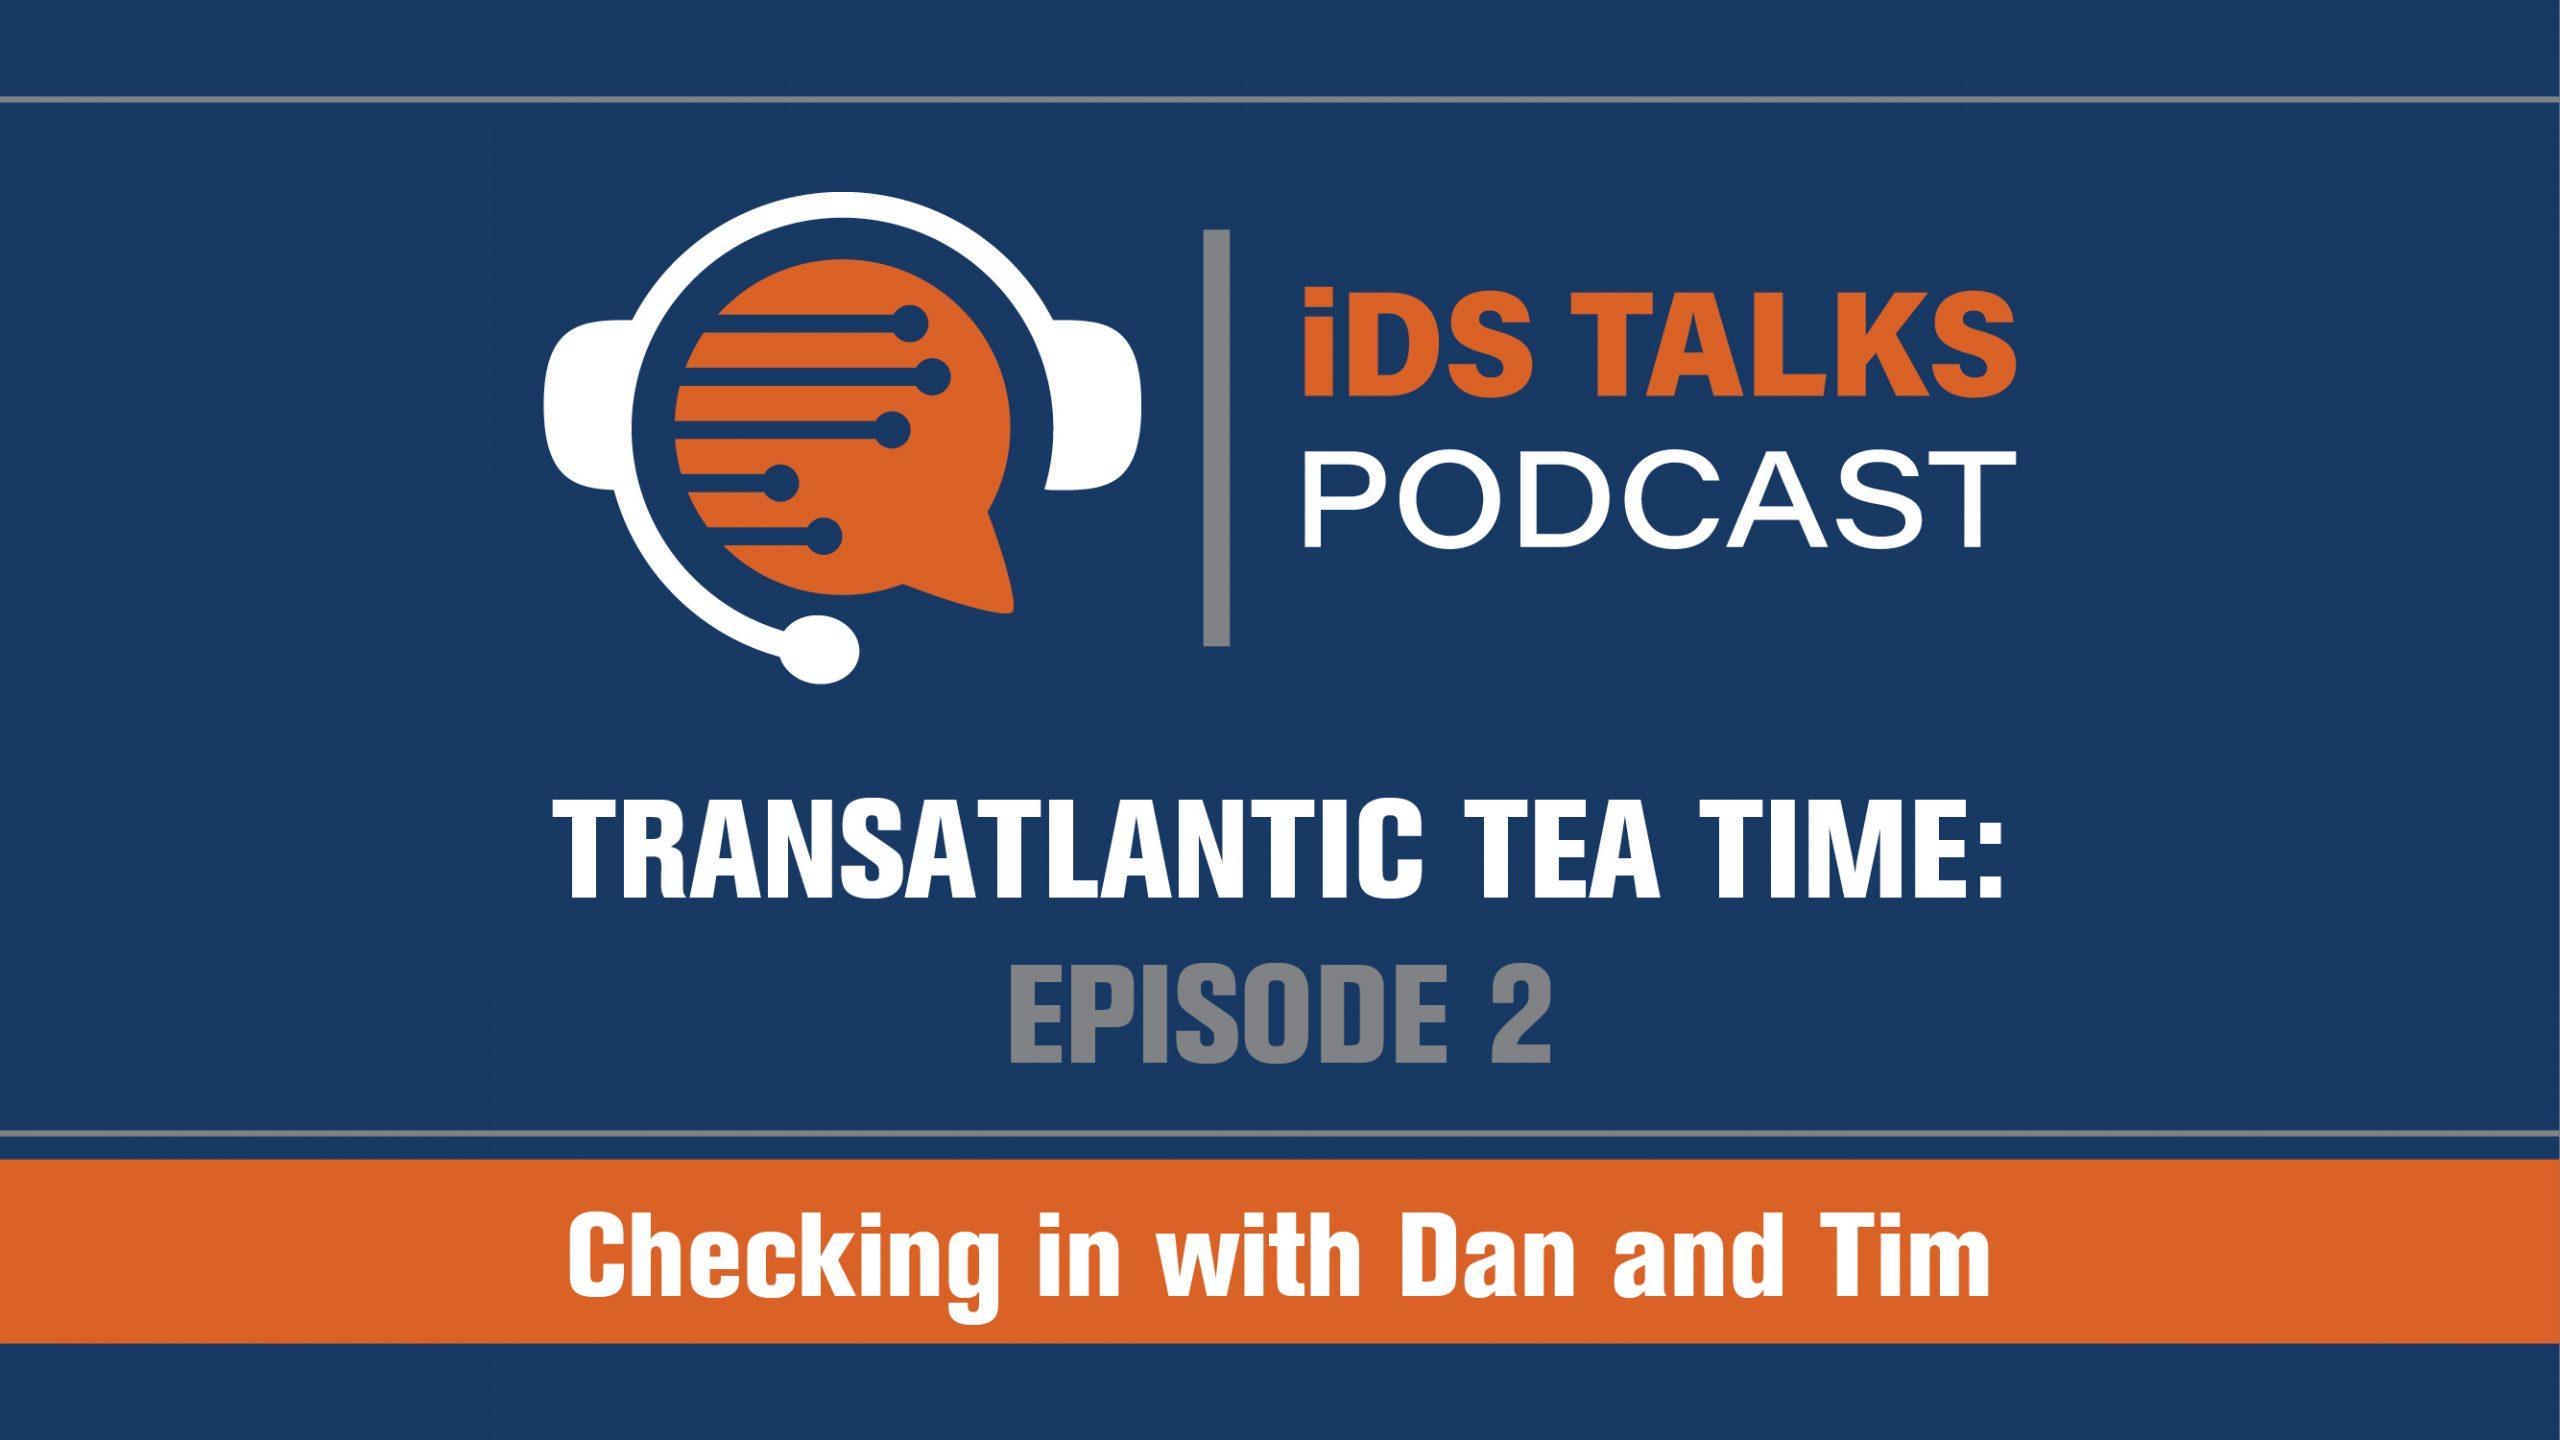 custom data solutions, iDS Transatlantic Tea time, Transatlantic Tea Time, iDS Podcast, iDiscovery Solutions Podcast, eDiscovery Podcast